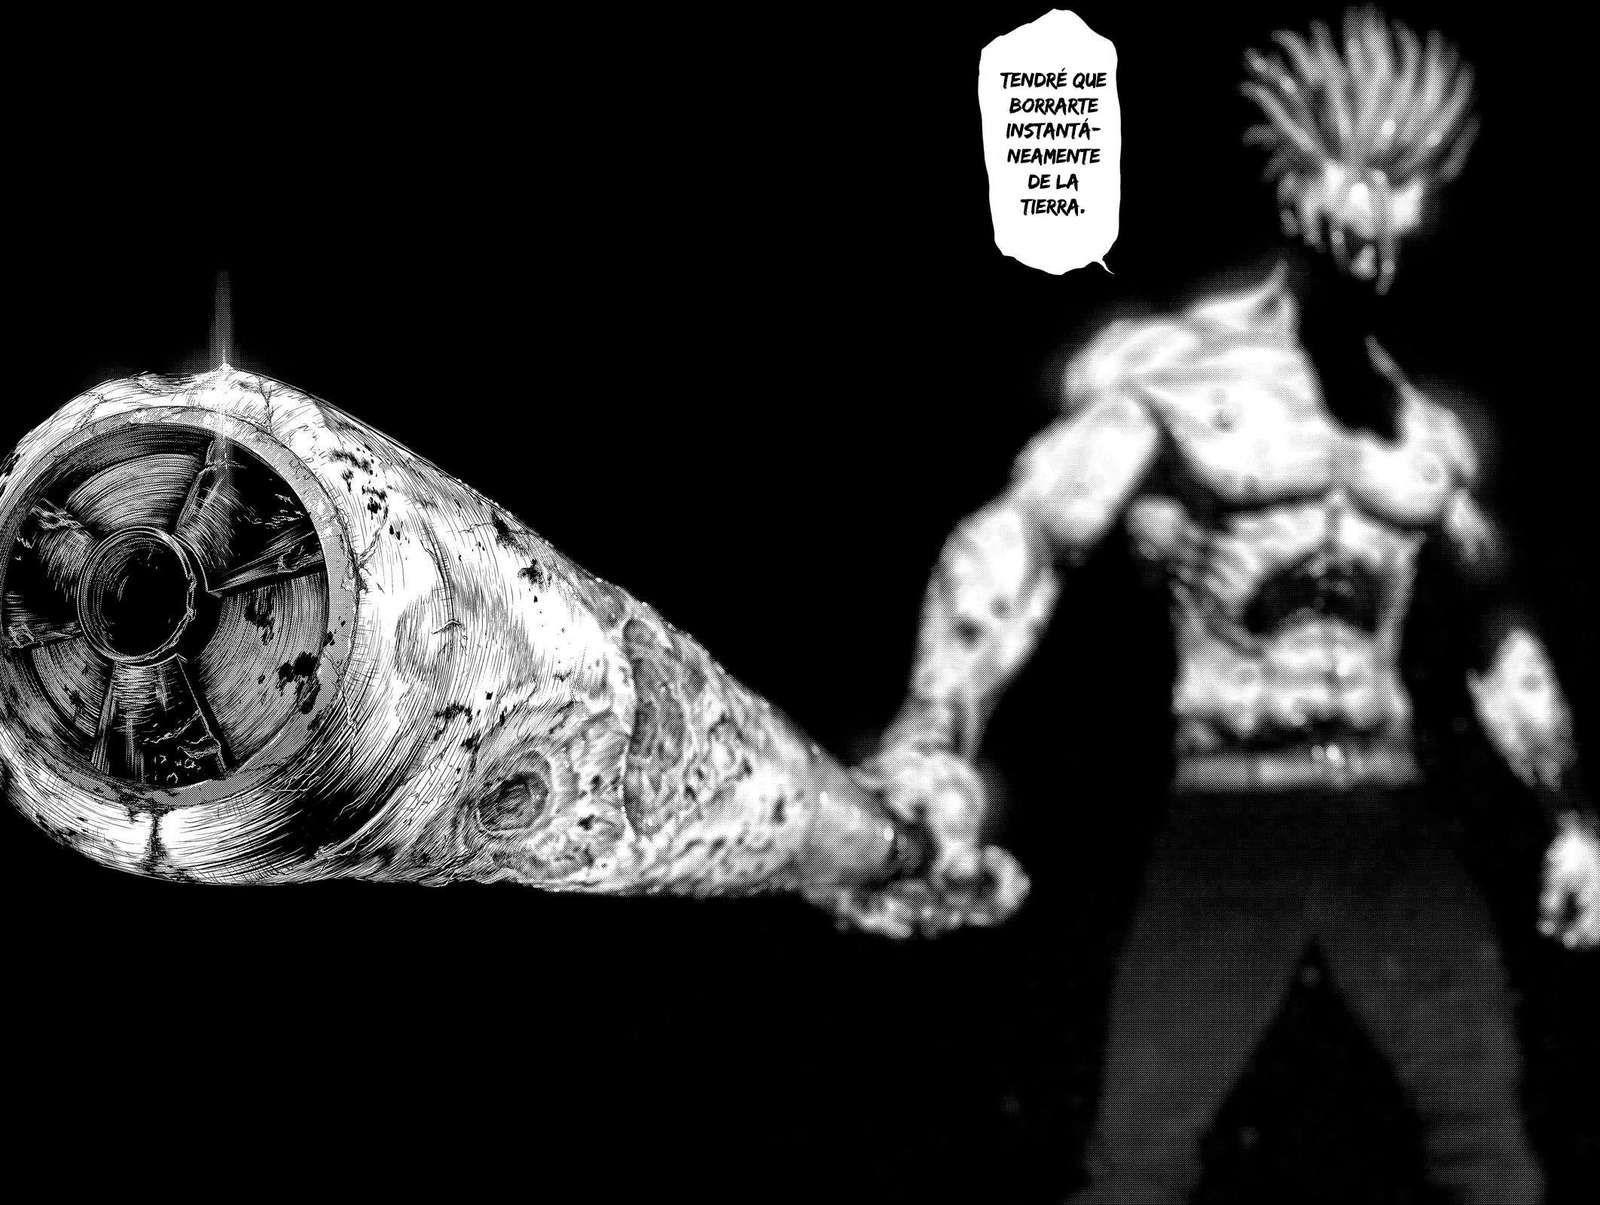 Sun Ken Rock 15600 Por Hellstone No Fansub En 2019 Arte